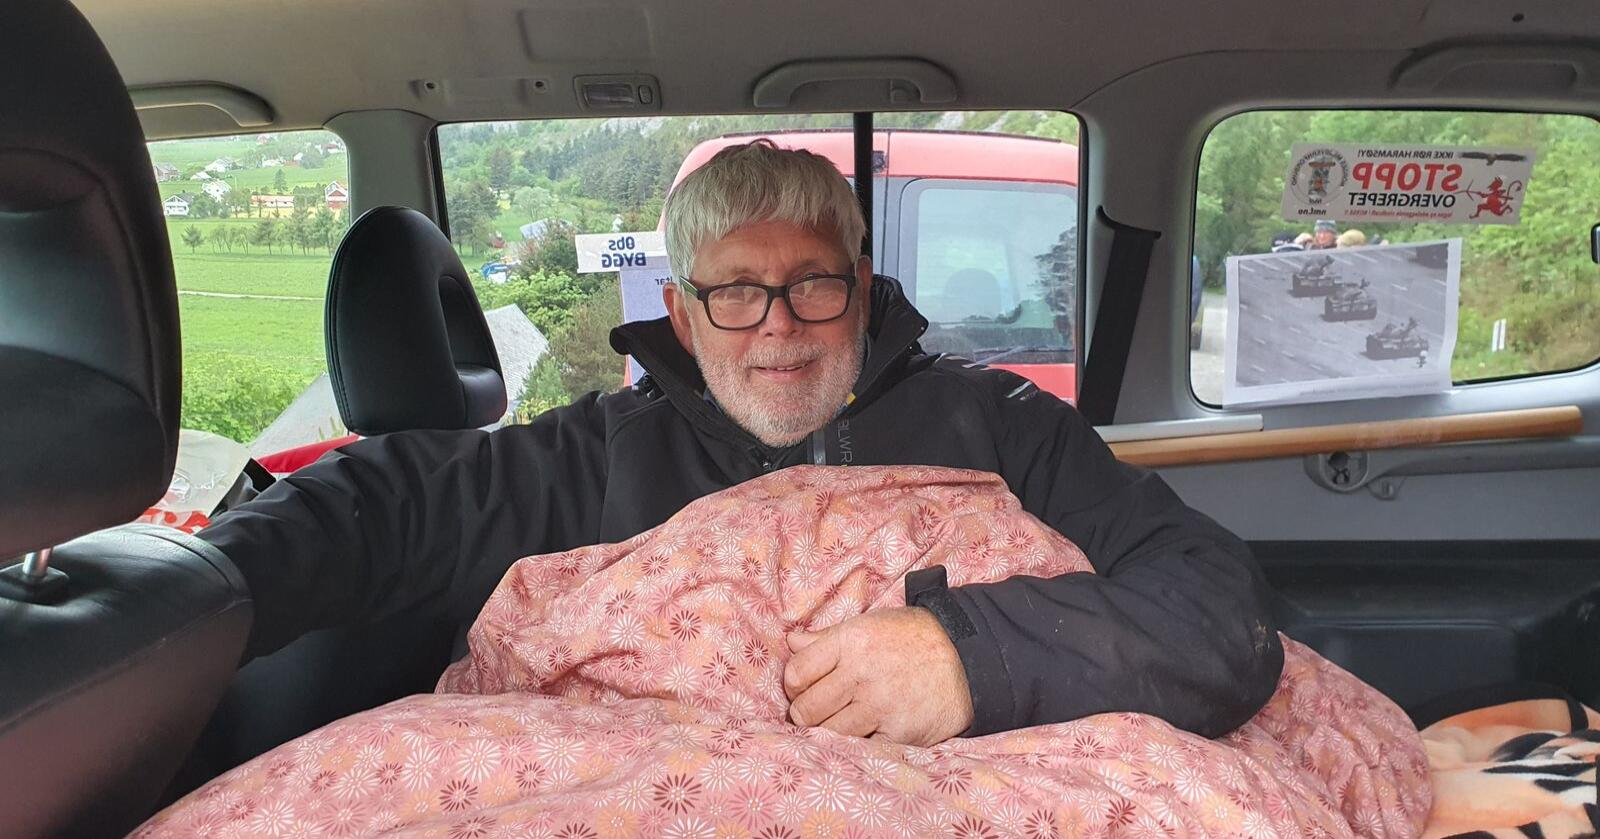 Hans Petter Thue har overnatta i bilen sidan torsdag 28. mai. Der har han planar om å bli så lenge han kan. Foto: Privat